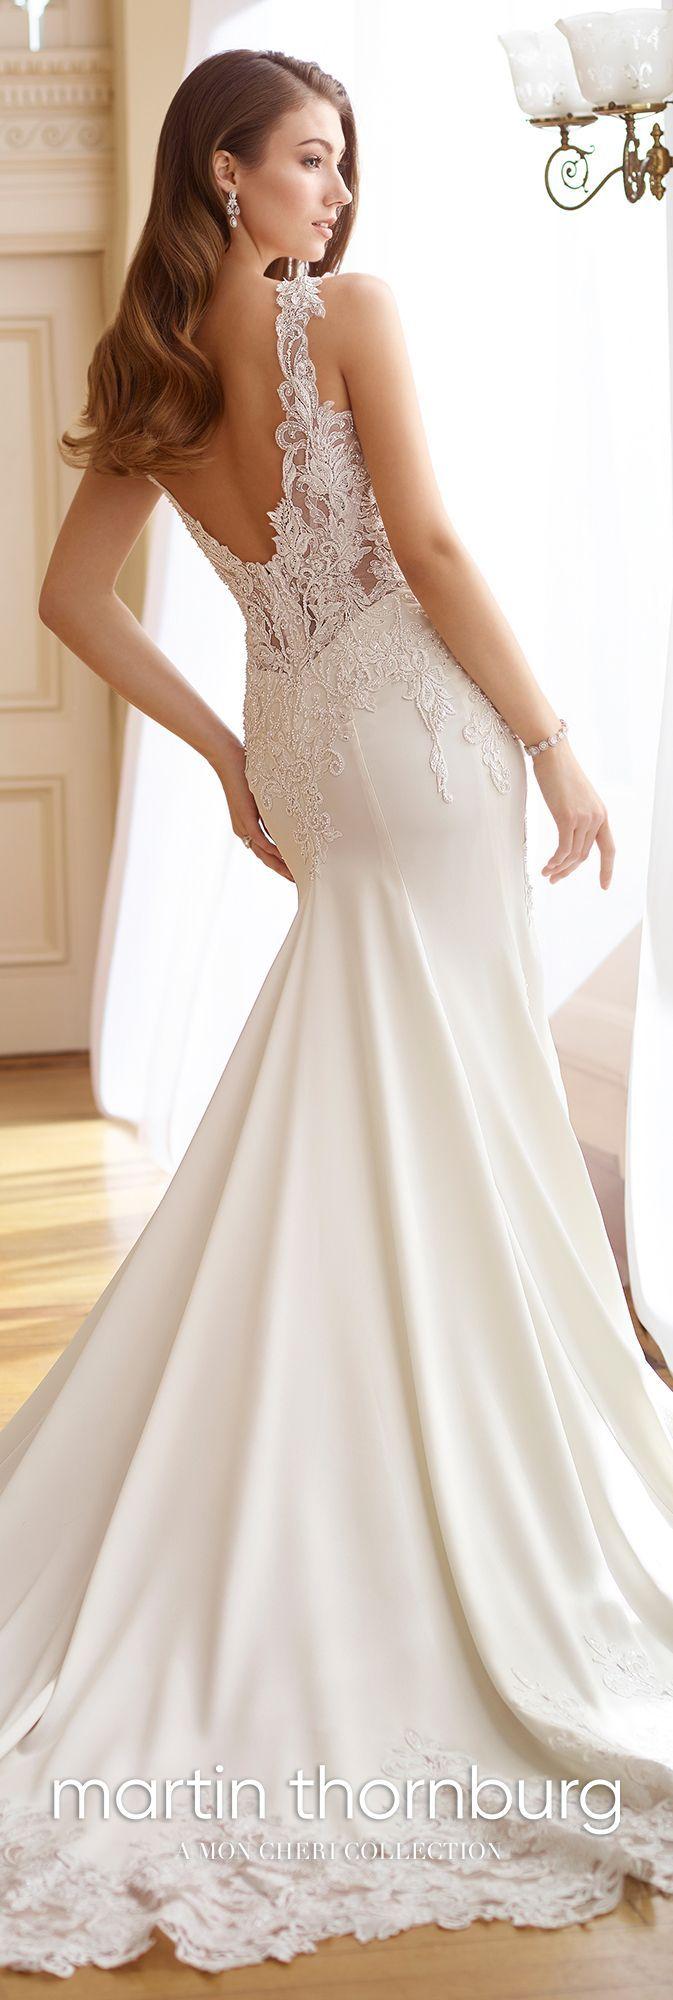 Belles wedding dress  Martin Thornburg  Frances  Lace bodice stretch satin wedding